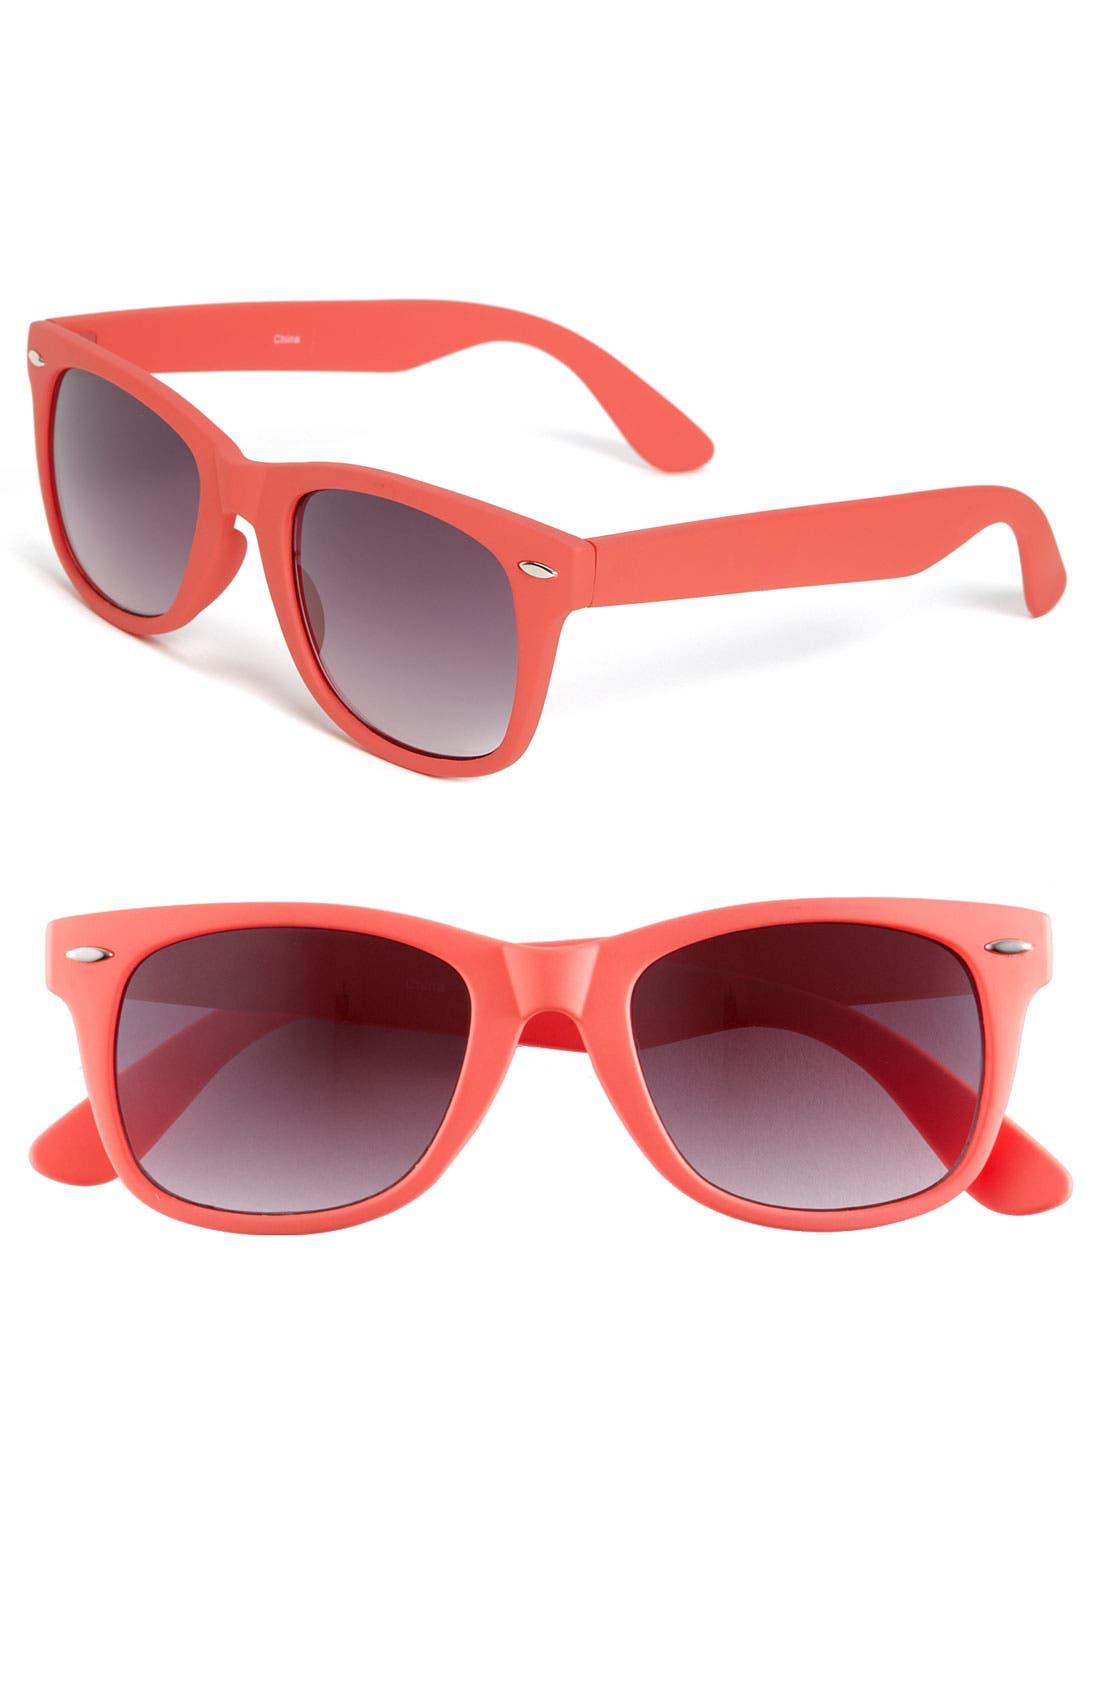 Alternate Image 1 Selected - Icon Eyewear 'Maureen' Sunglasses (2 for $20)